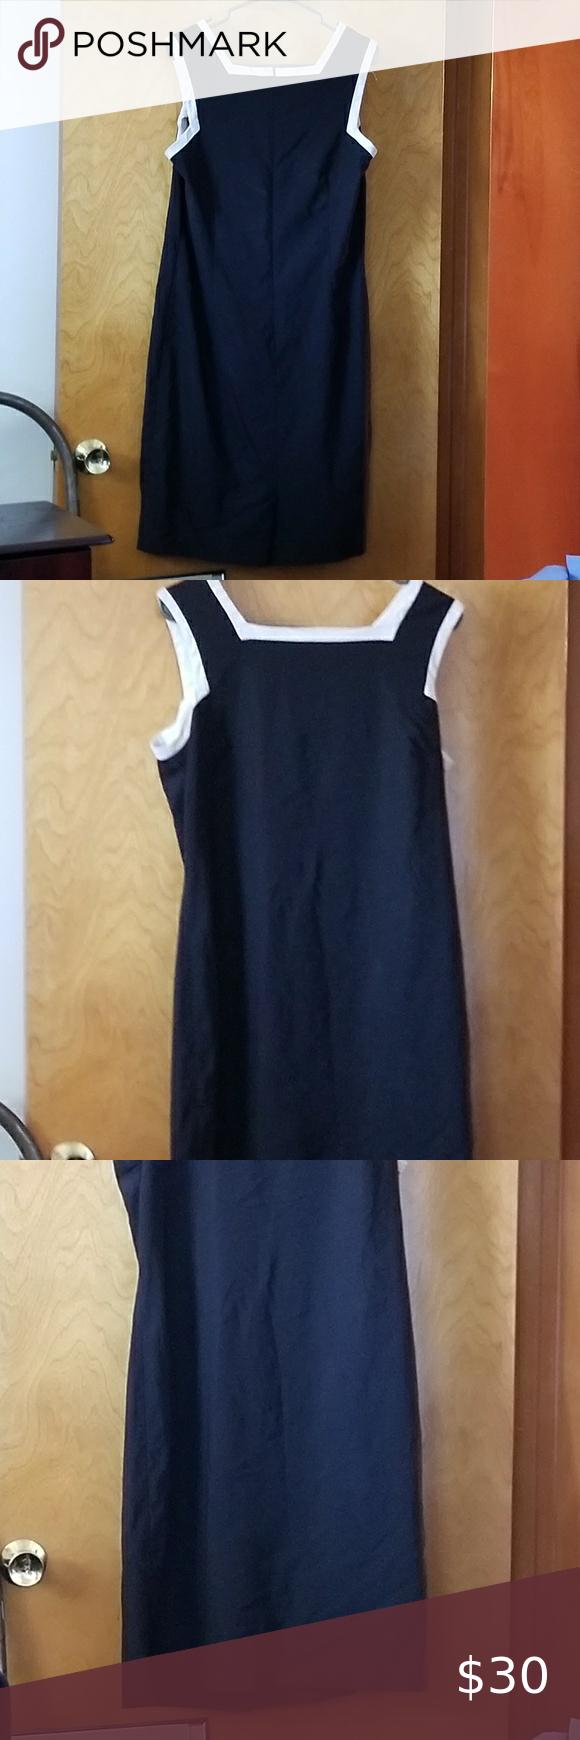 Copy Black Dress White Piping Clothes Design White Dress Dresses [ 1740 x 580 Pixel ]